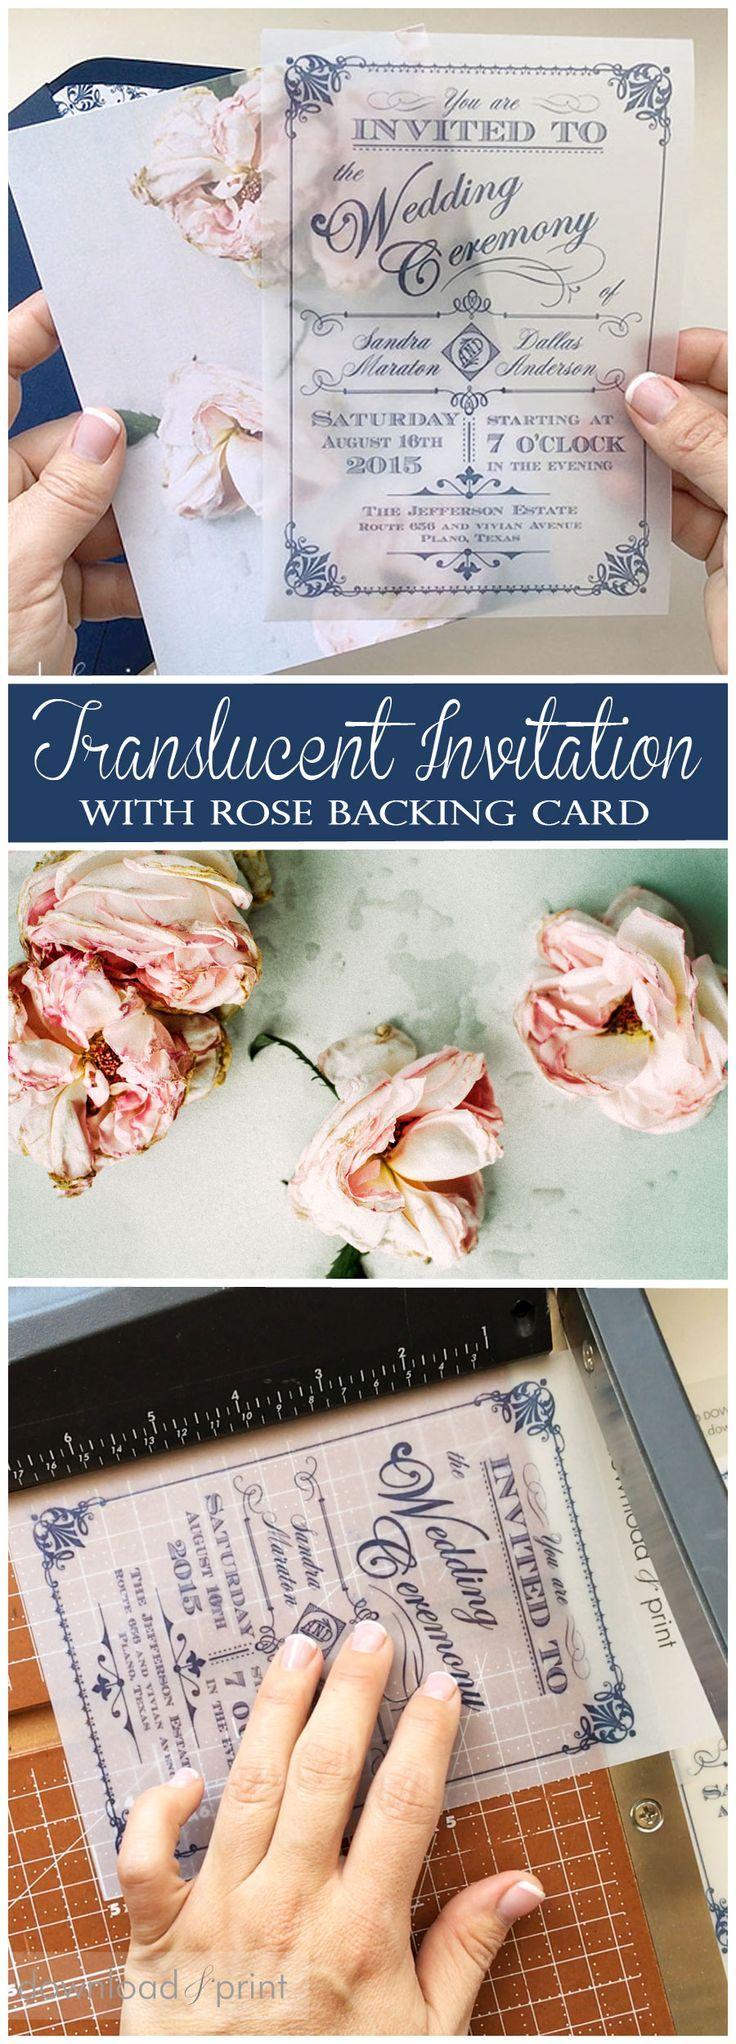 best invitaciones images on pinterest invitation cards